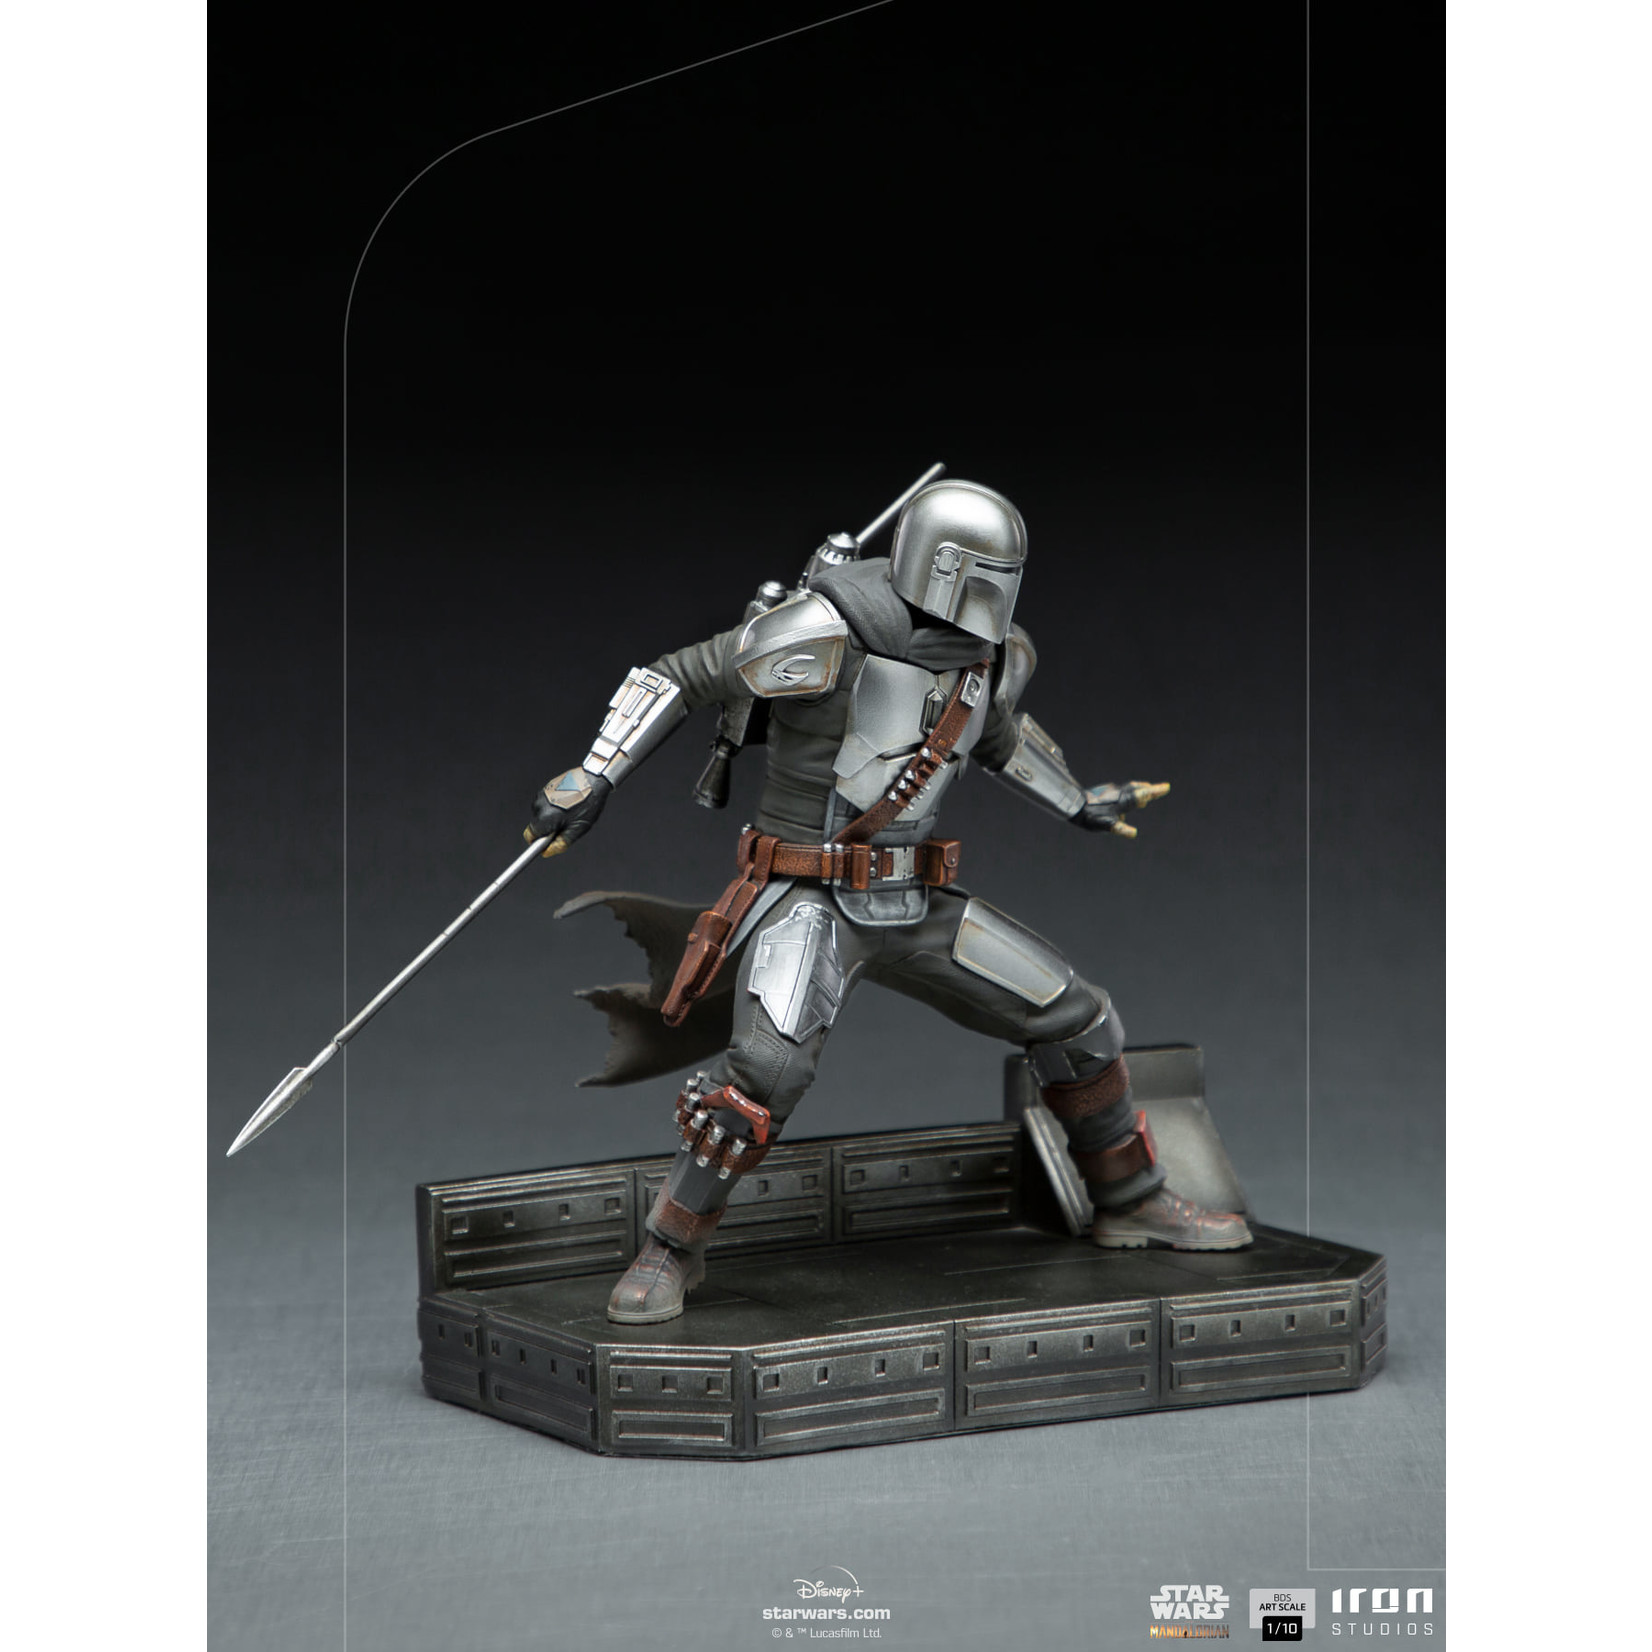 Iron Studios [Preorder] The Mandalorian Battle Diorama Series The Mandalorian 1/10 Art Scale Limited Edition Statue